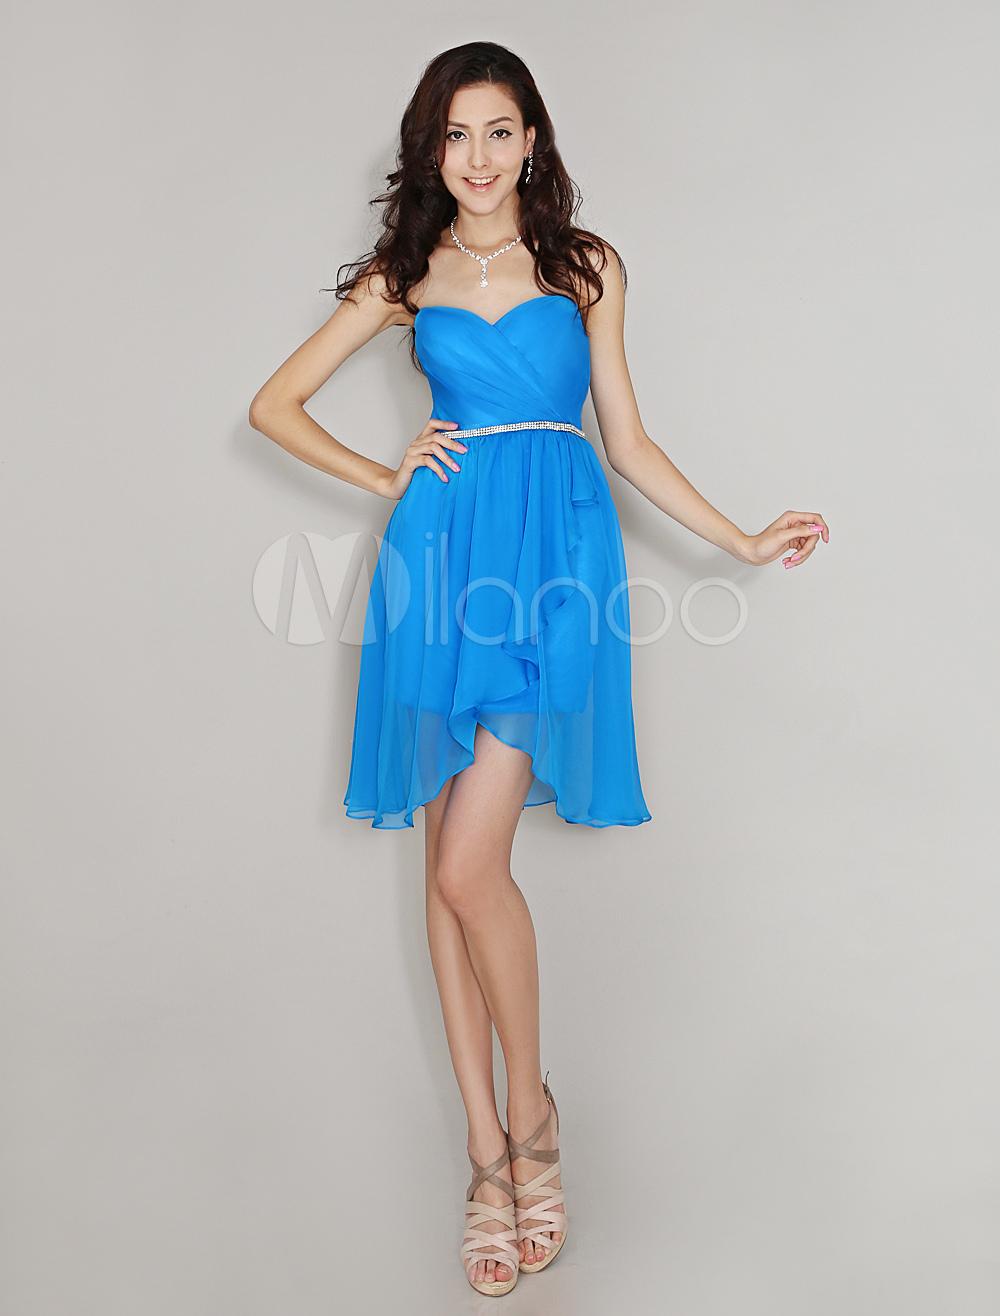 Sweetheart Neck Beaded Chiffon Bridesmaid Dress With Fabulous Body Shaping Belt Milanoo